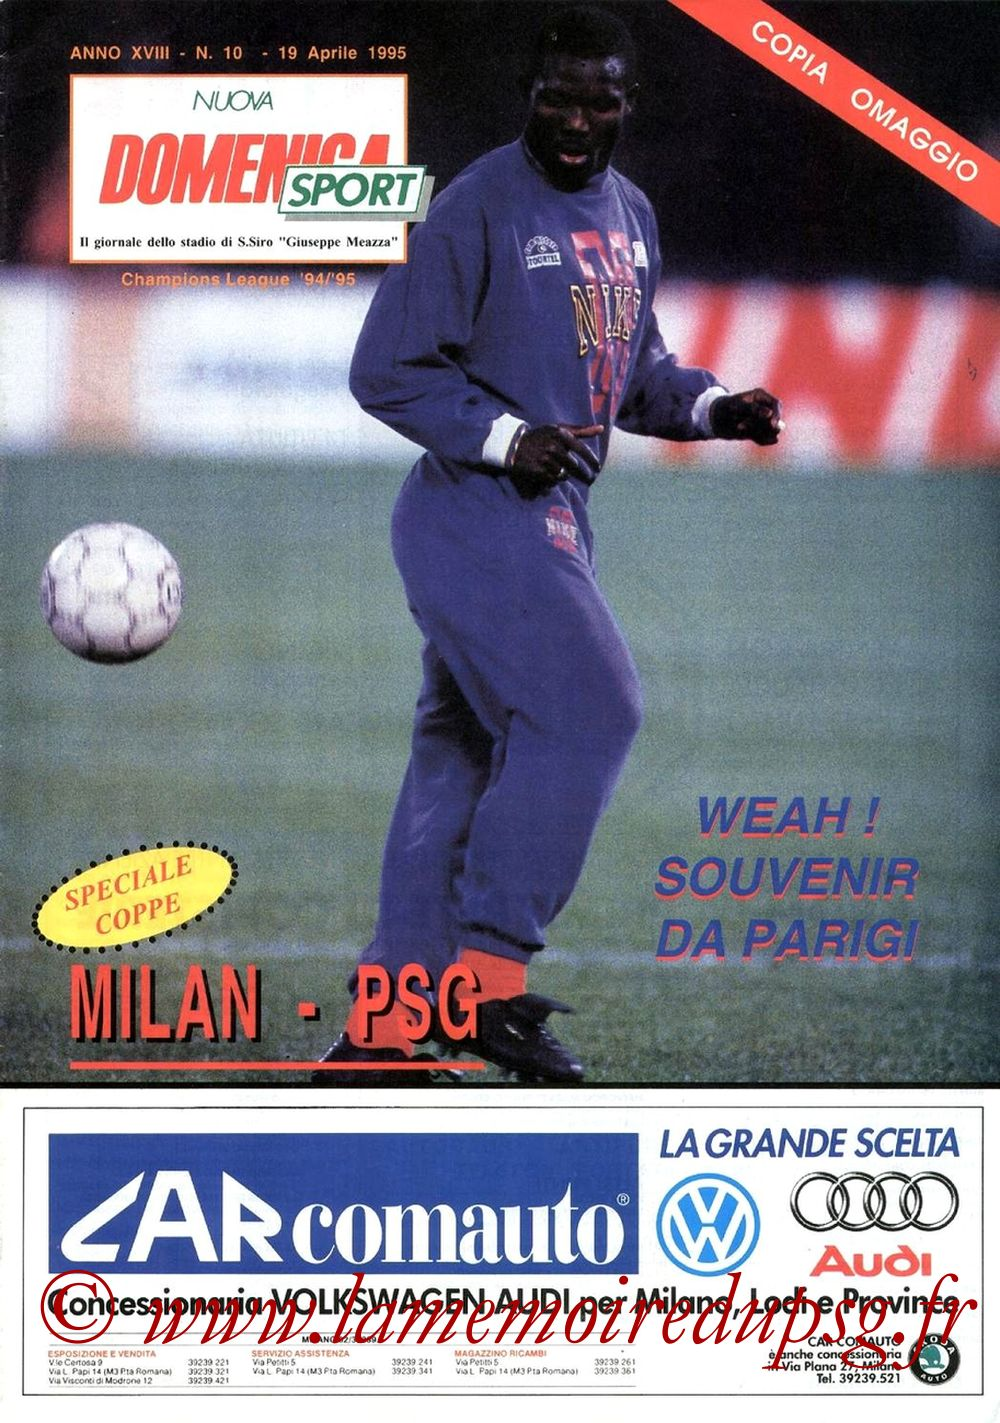 1995-04-19  Milan AC-PSG (Demi-Finale Aller C1, Nuova domenica sport)